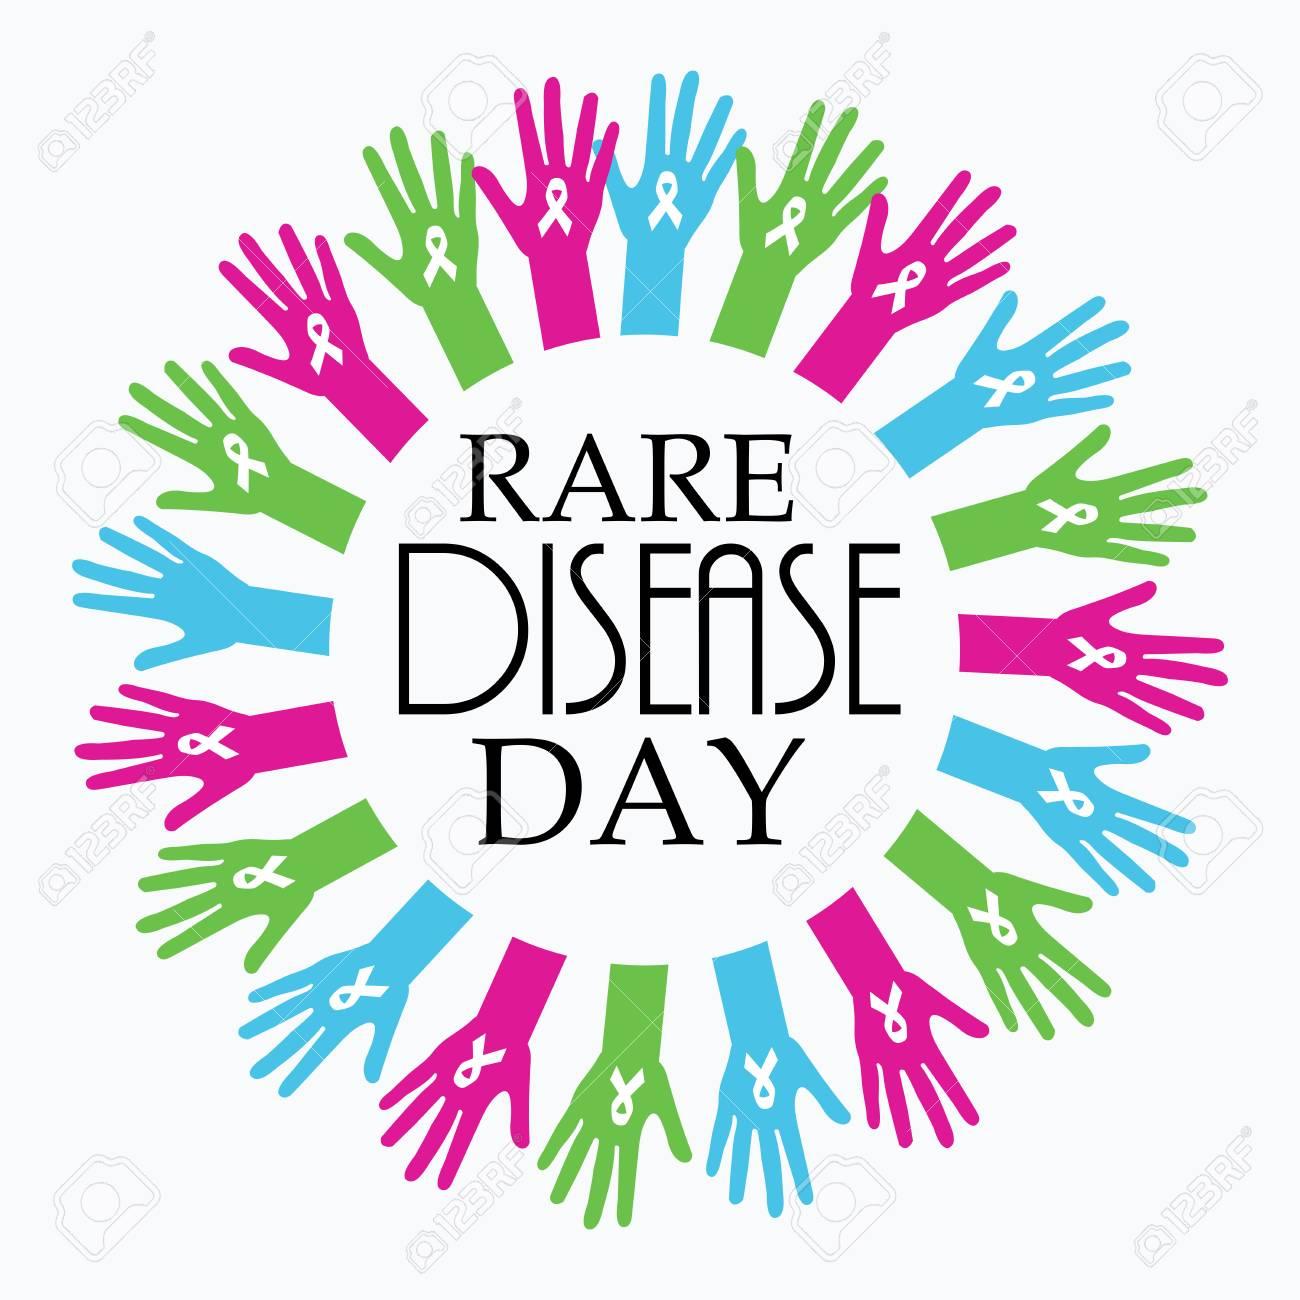 94308906-rare-disease-day-template-banner-design-.jpg